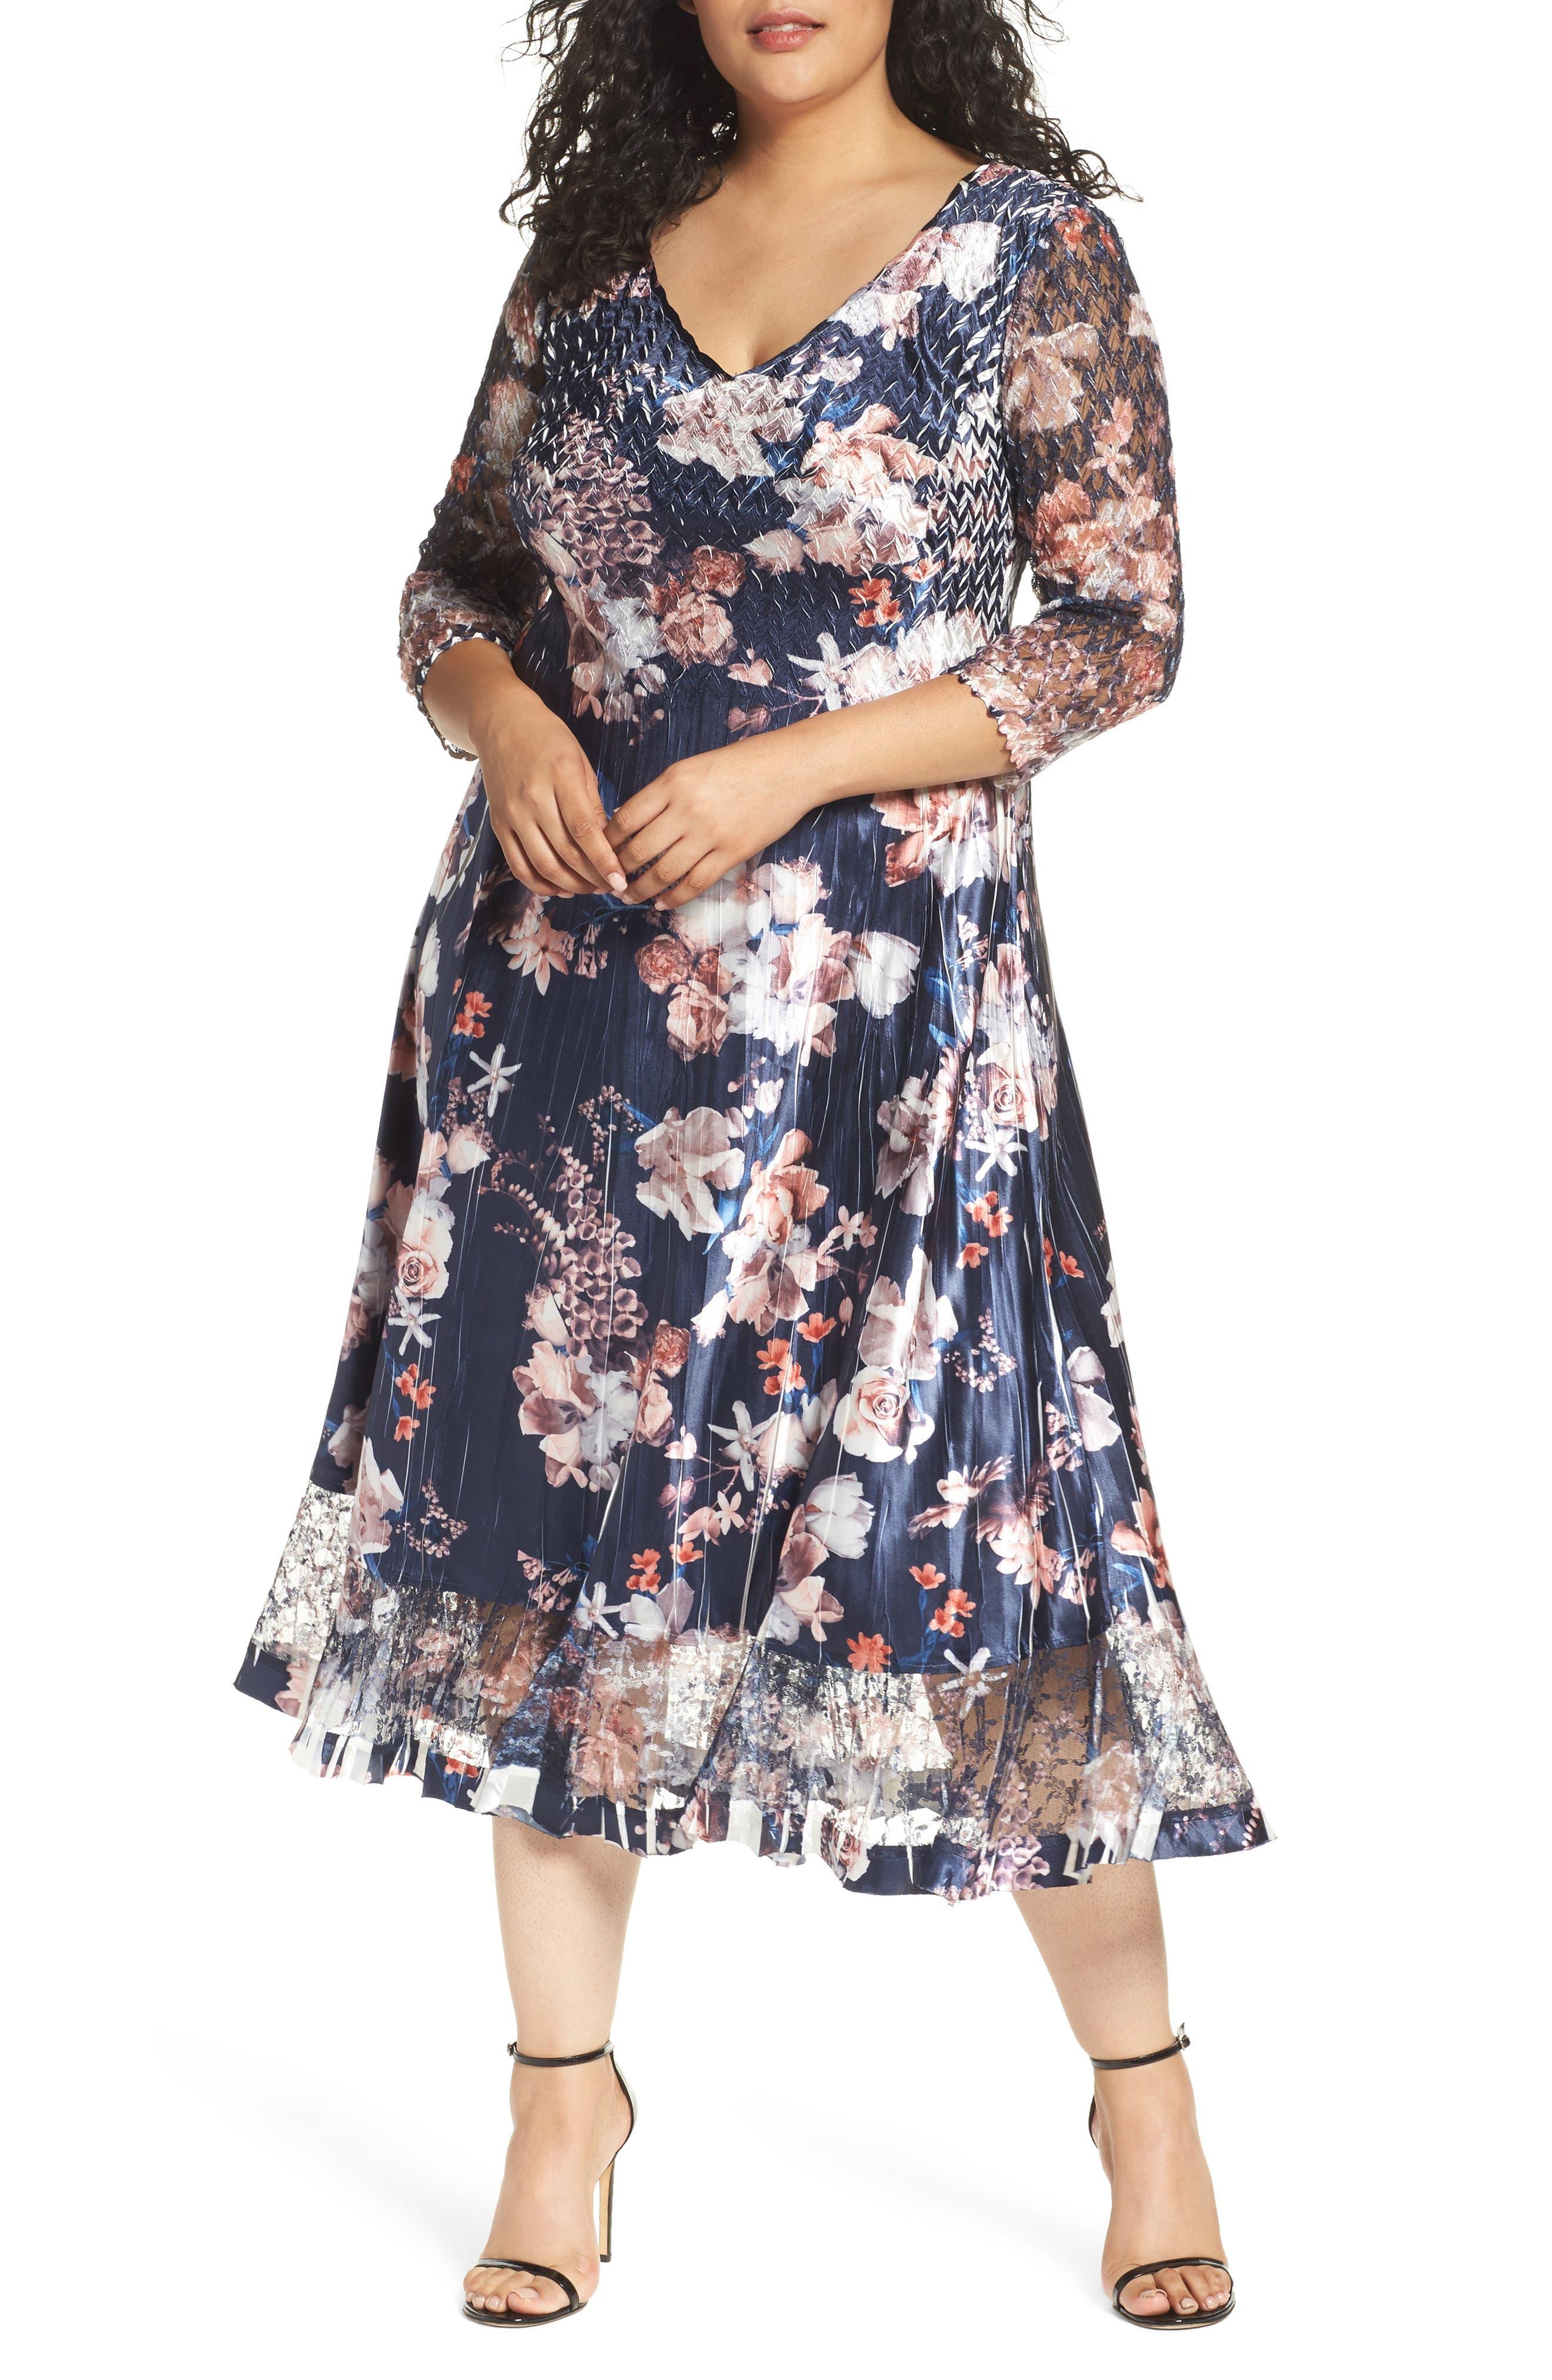 Nordstrom Dresses Mother of the Bride Spring 2018